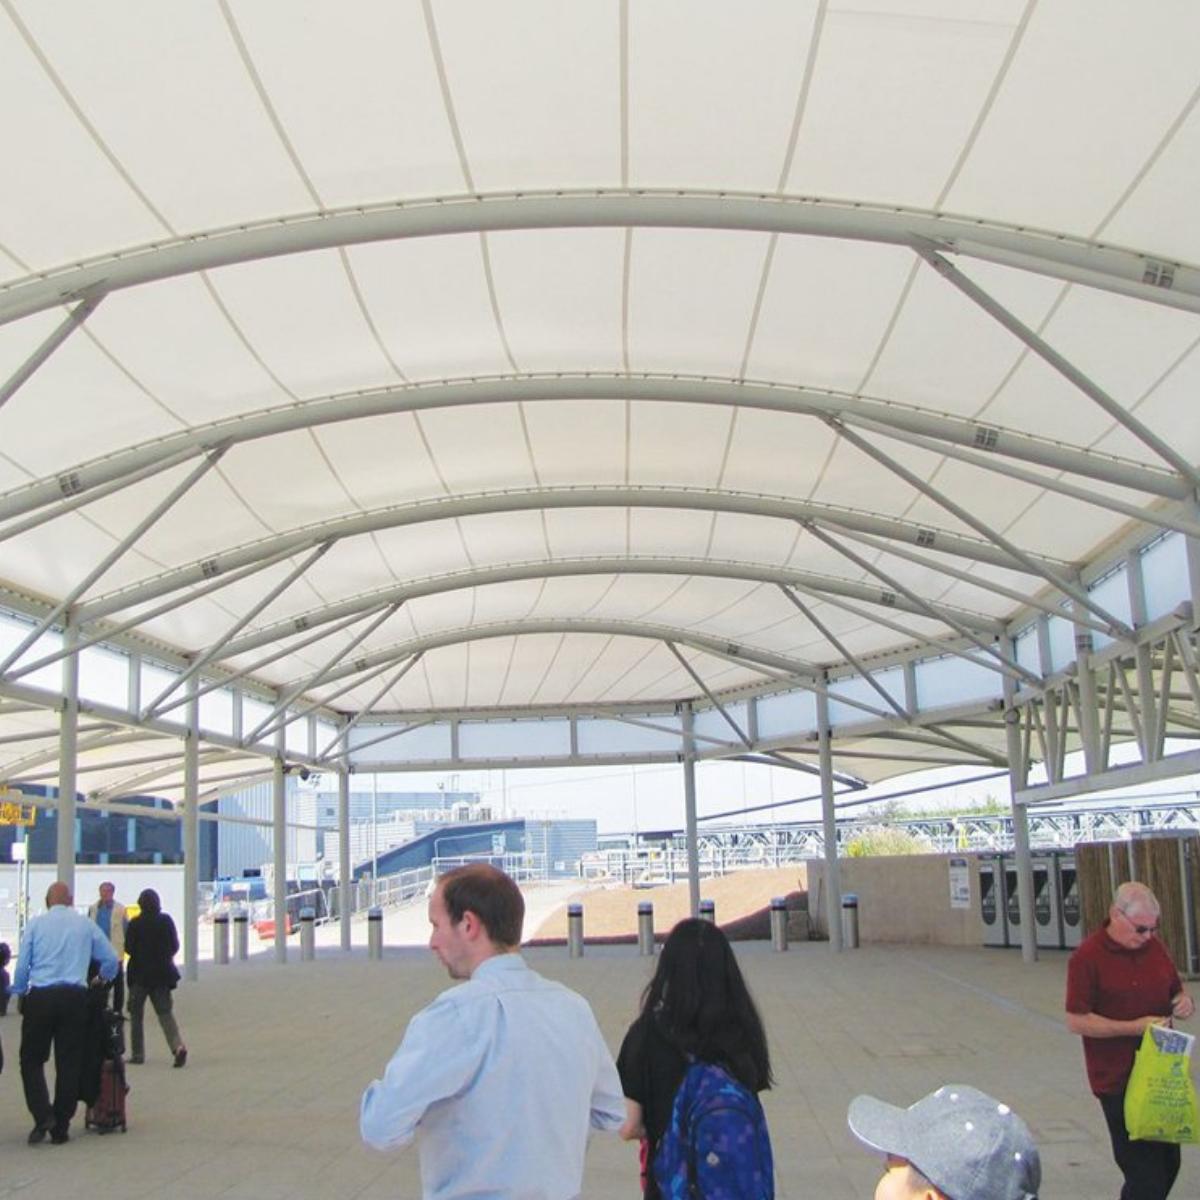 Concourse Canopy